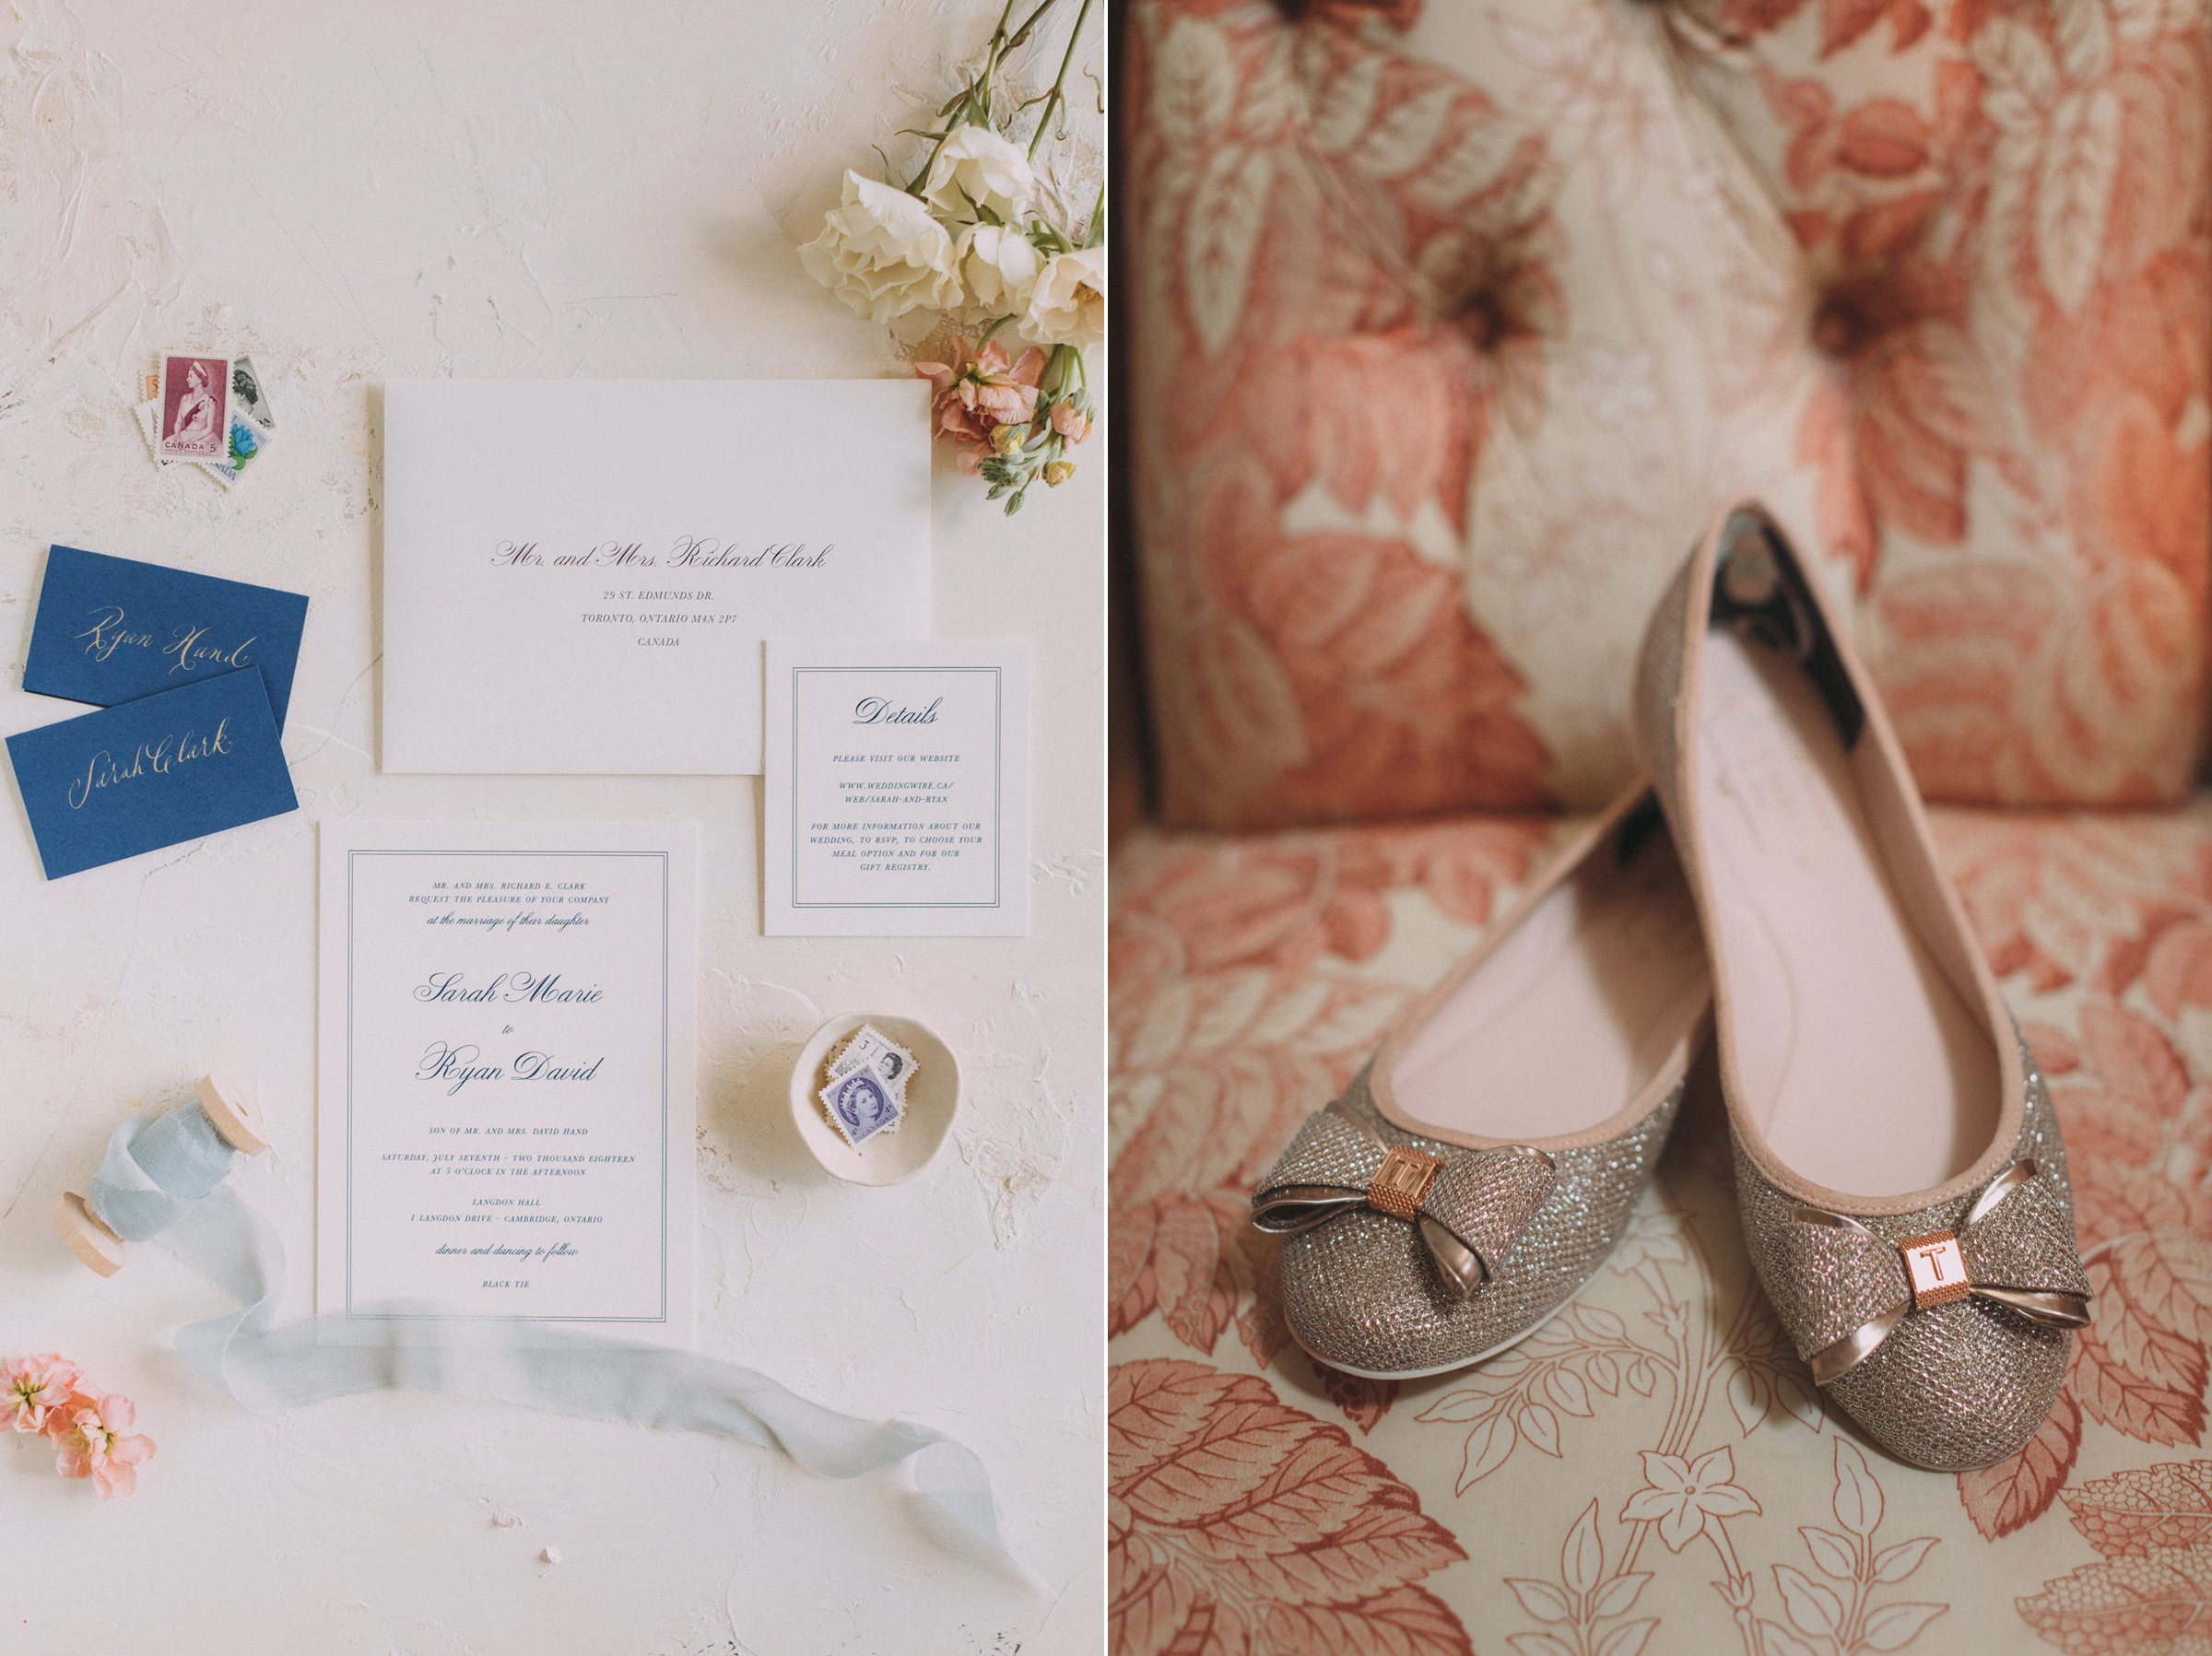 Langdon-Hall-wedding-photography-Cambridge-by-Sam-Wong-of-Visual-Cravings_Sarah-Ryan_01.jpg